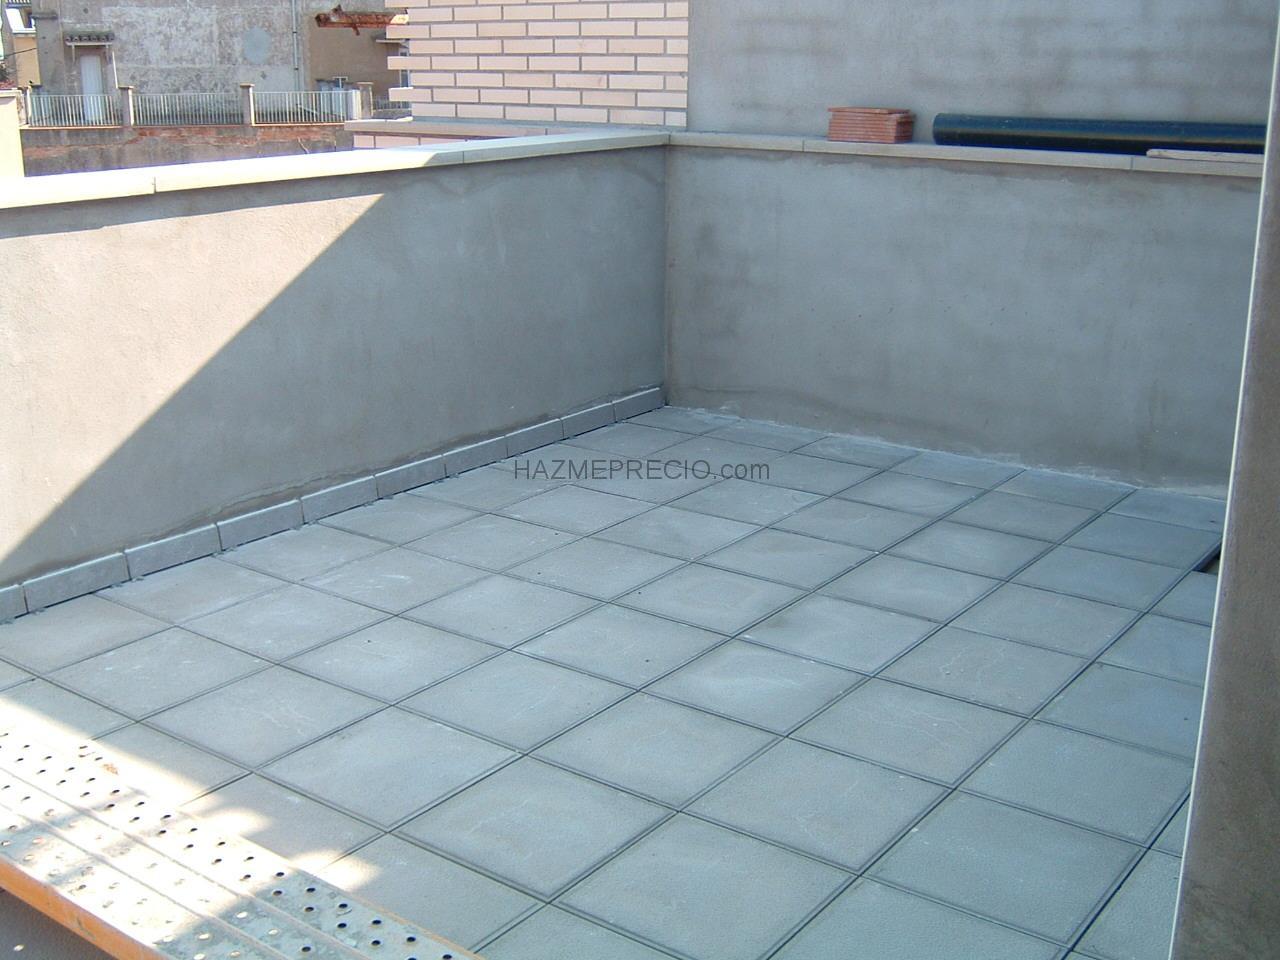 Castell 3 construccions sl 08280 calaf barcelona - Pavimento terraza exterior ...